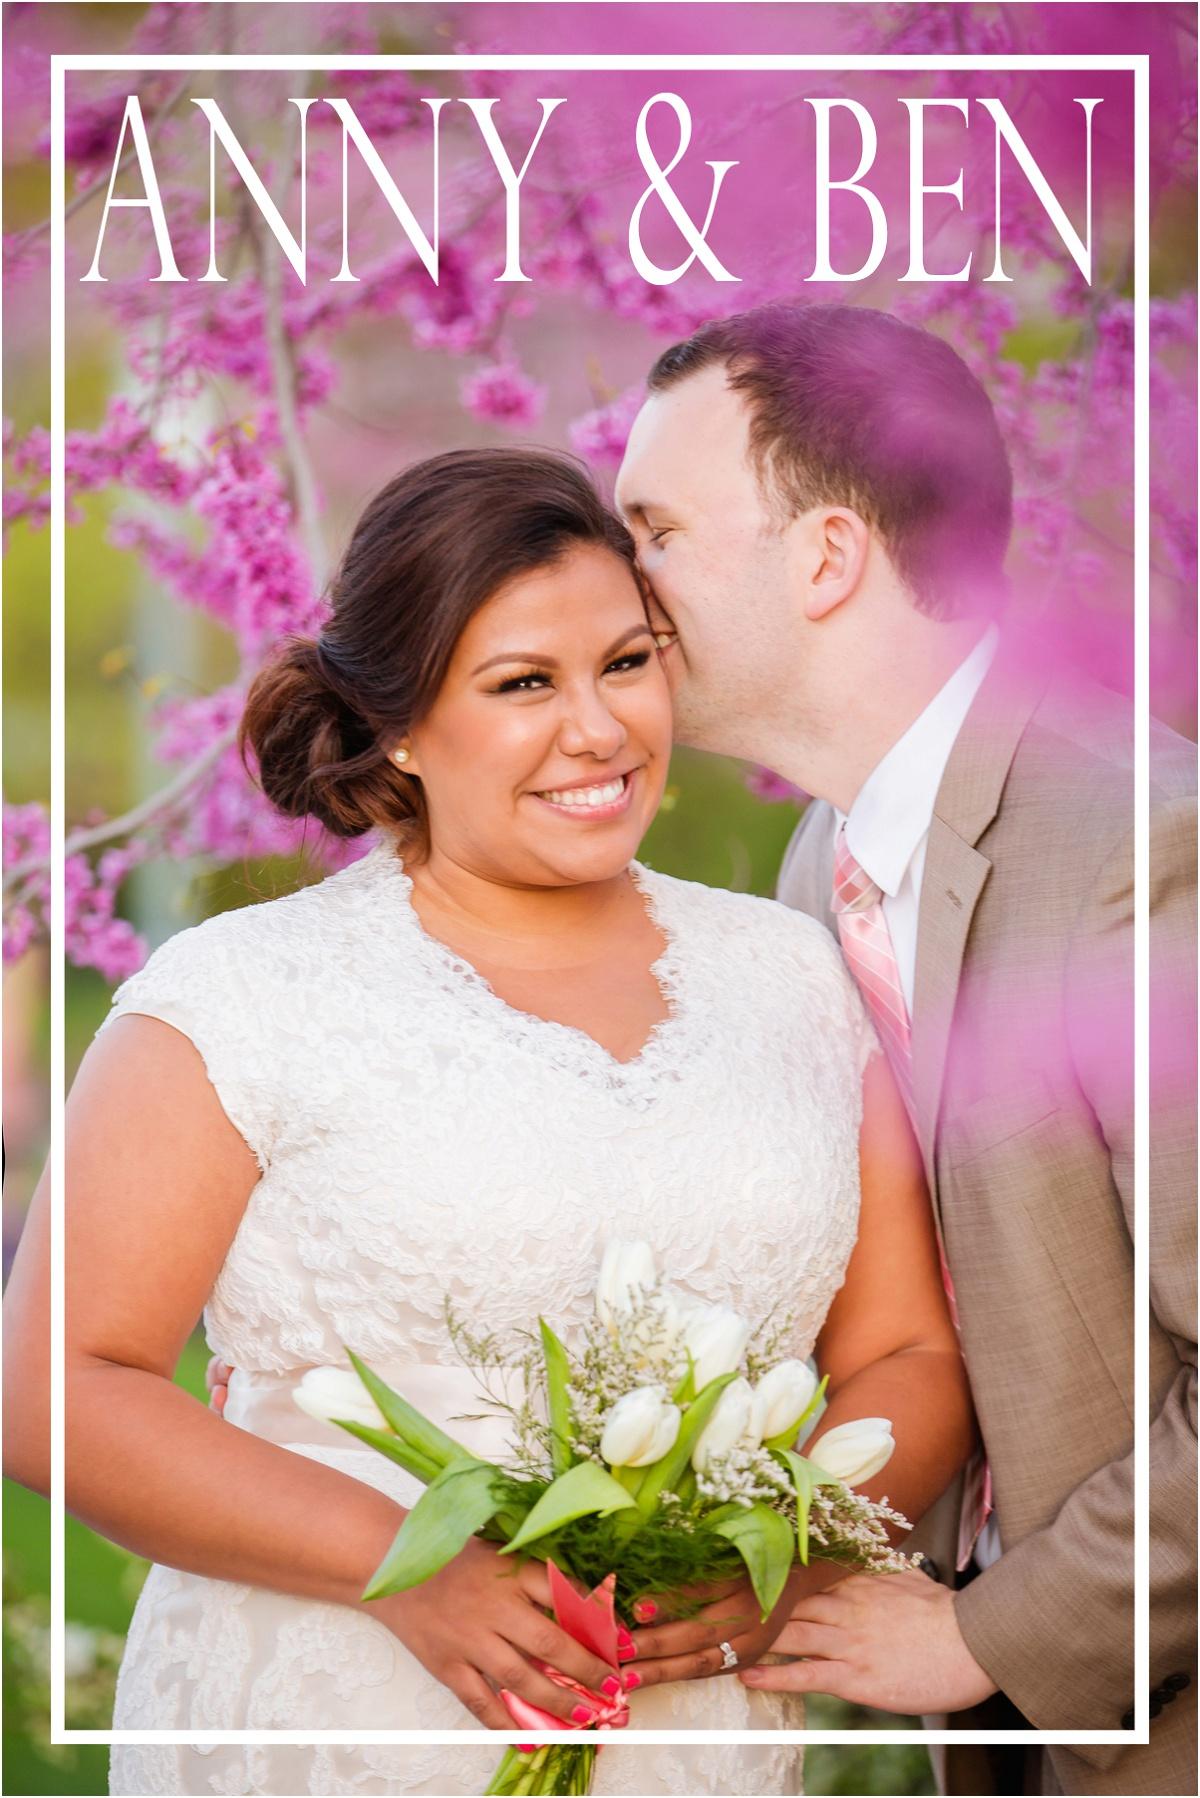 Terra Cooper Photography Weddings Brides 2015_5382.jpg